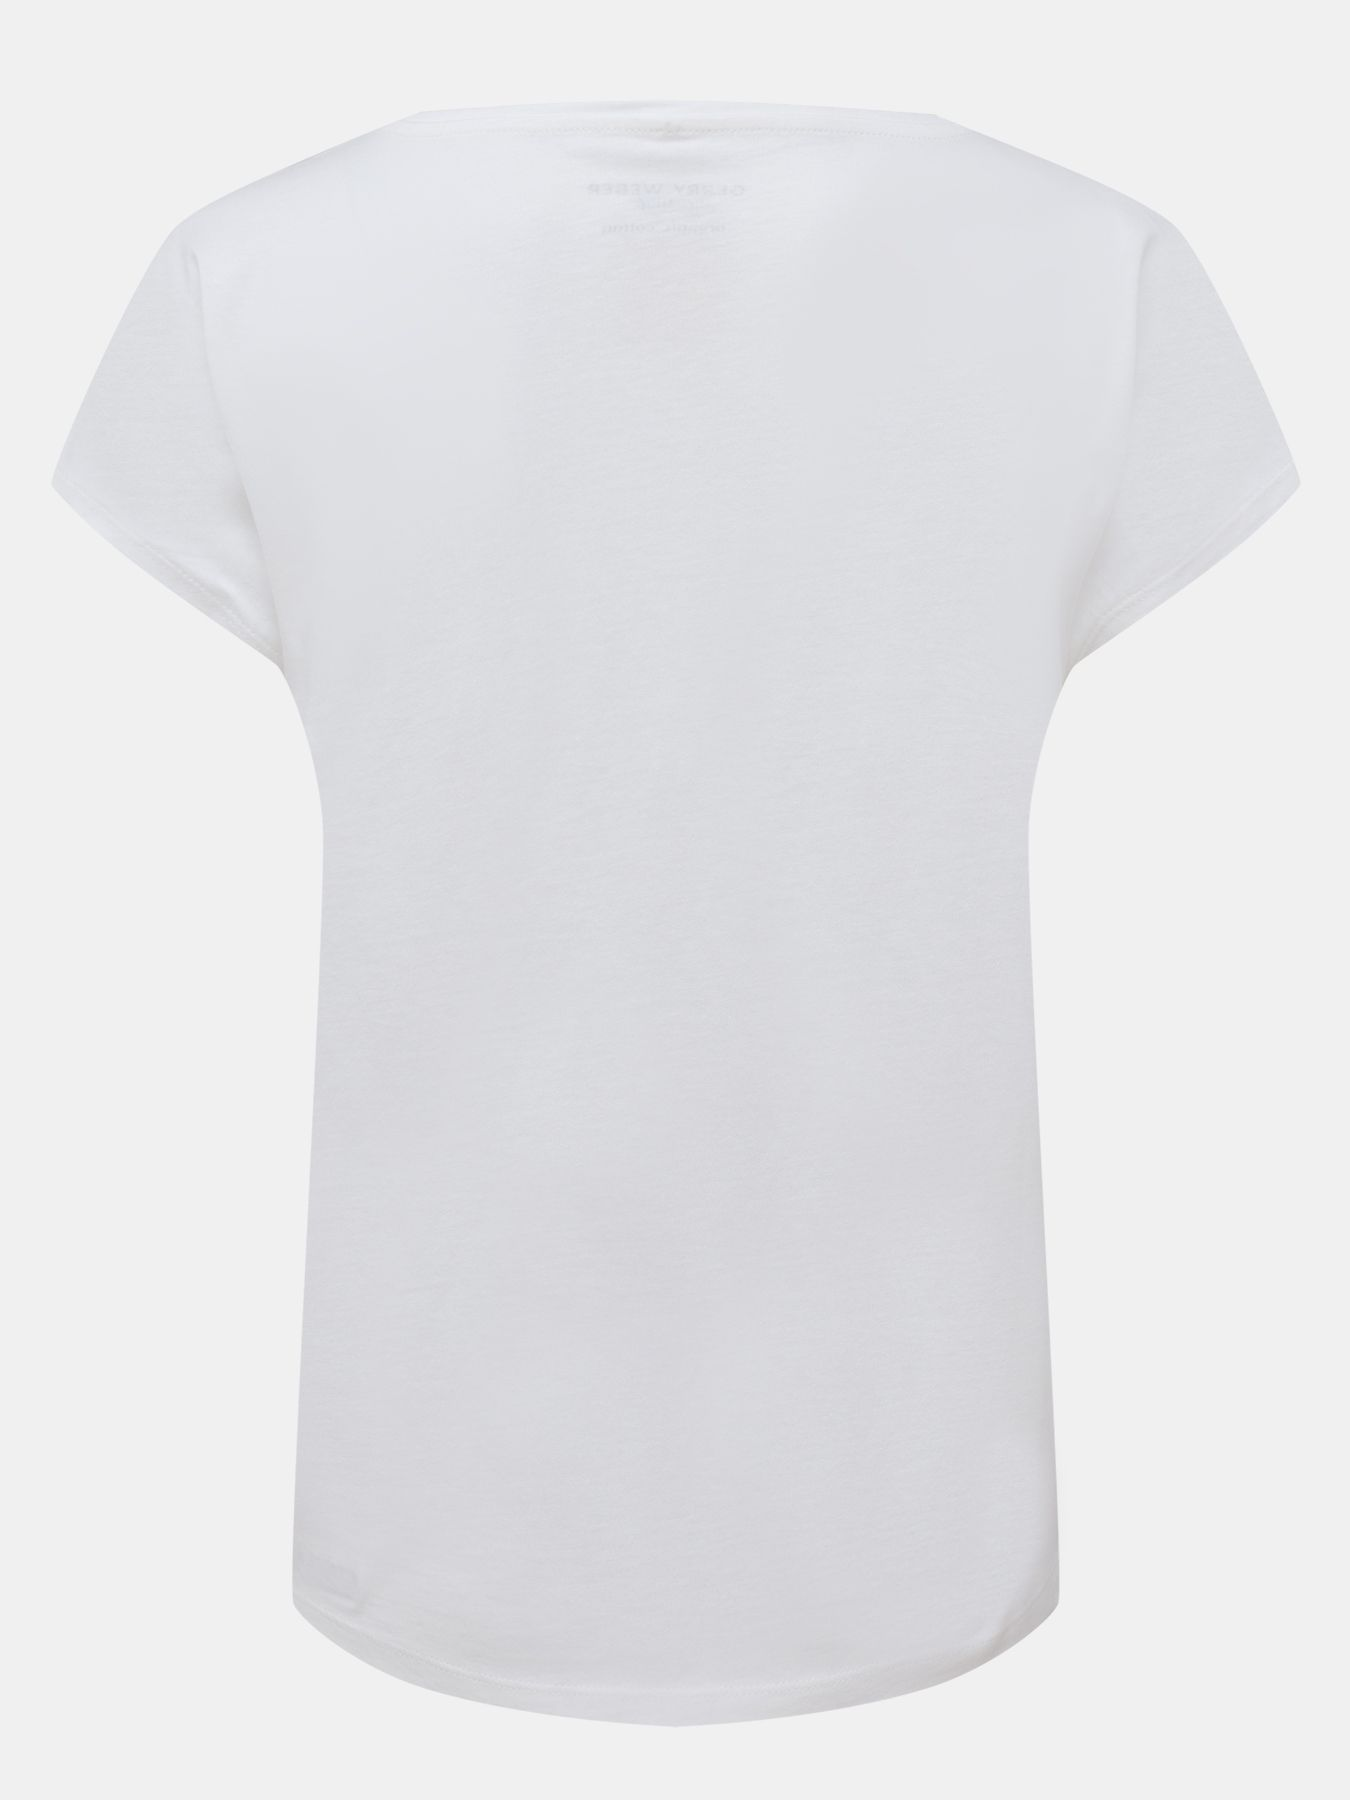 Фуфайка (футболка) Gerry Weber Casual Футболка